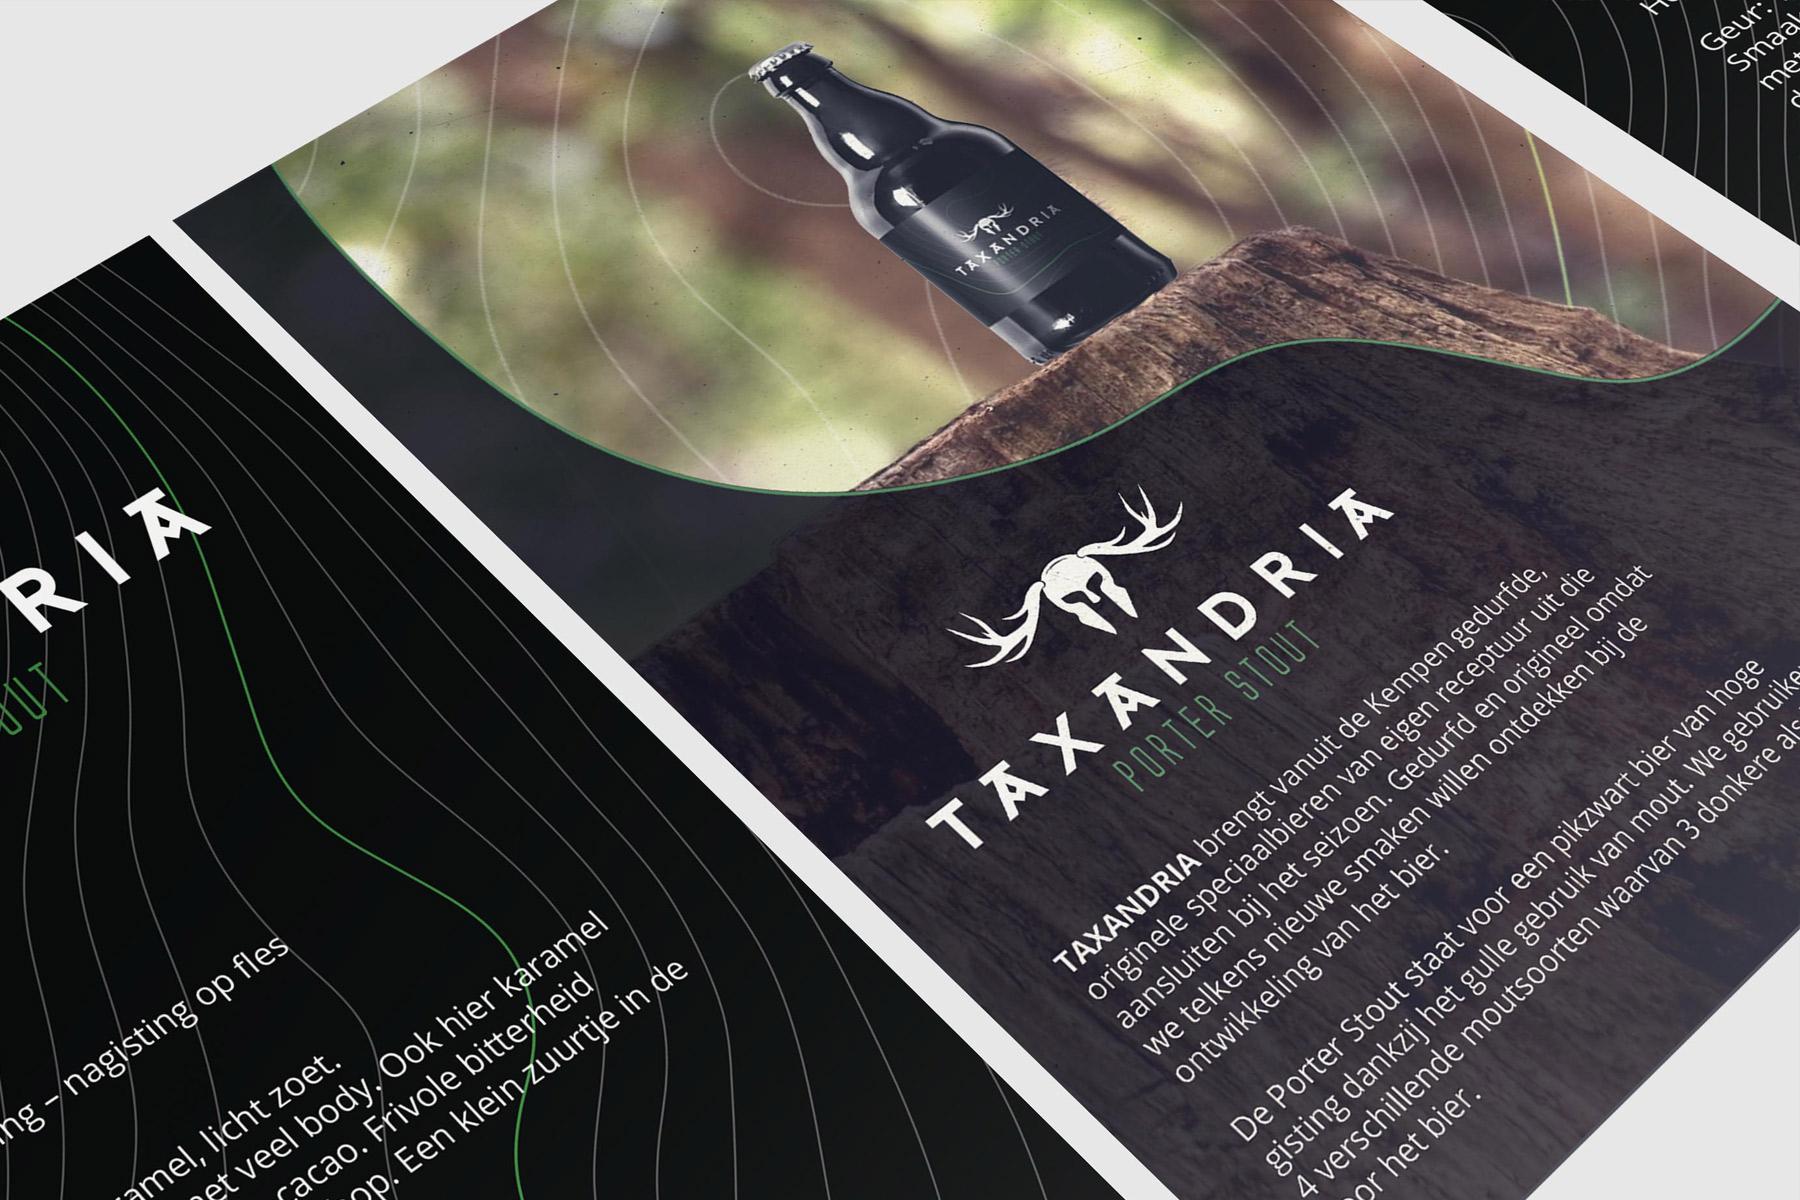 taxandria-porter-stout-flyer-1800×1200